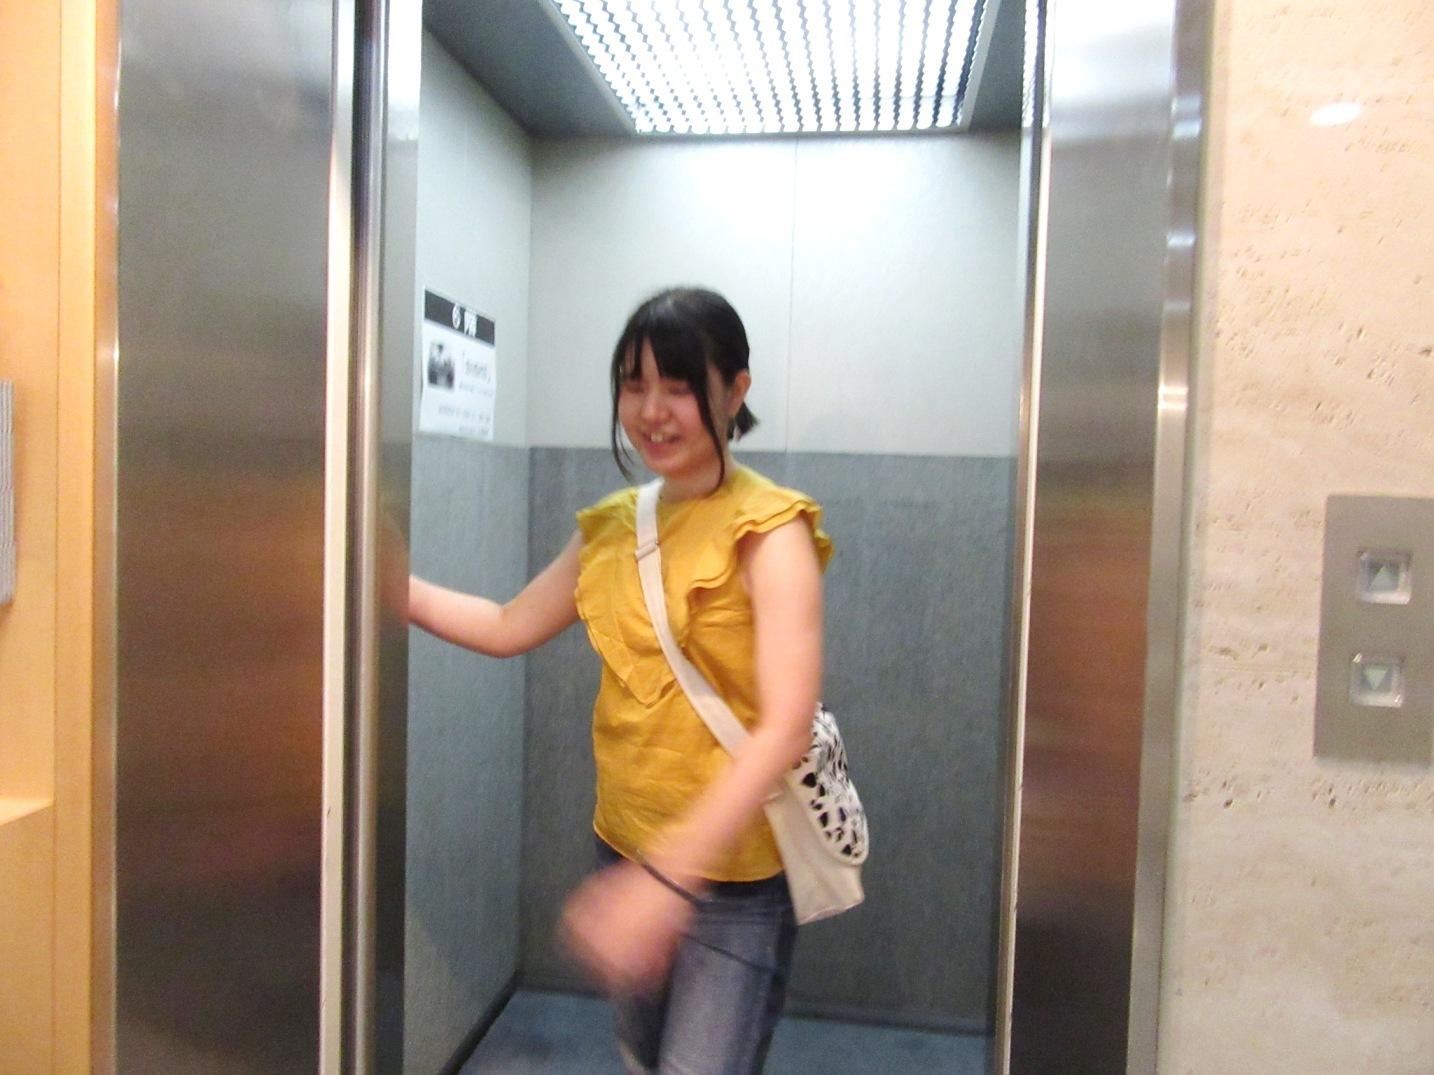 2570)③「『moment』 篠原 奈那子(藤女子大学4年)写真展」 アートスペース201 8月3日(木)~8月7日(火)_f0126829_11051363.jpg